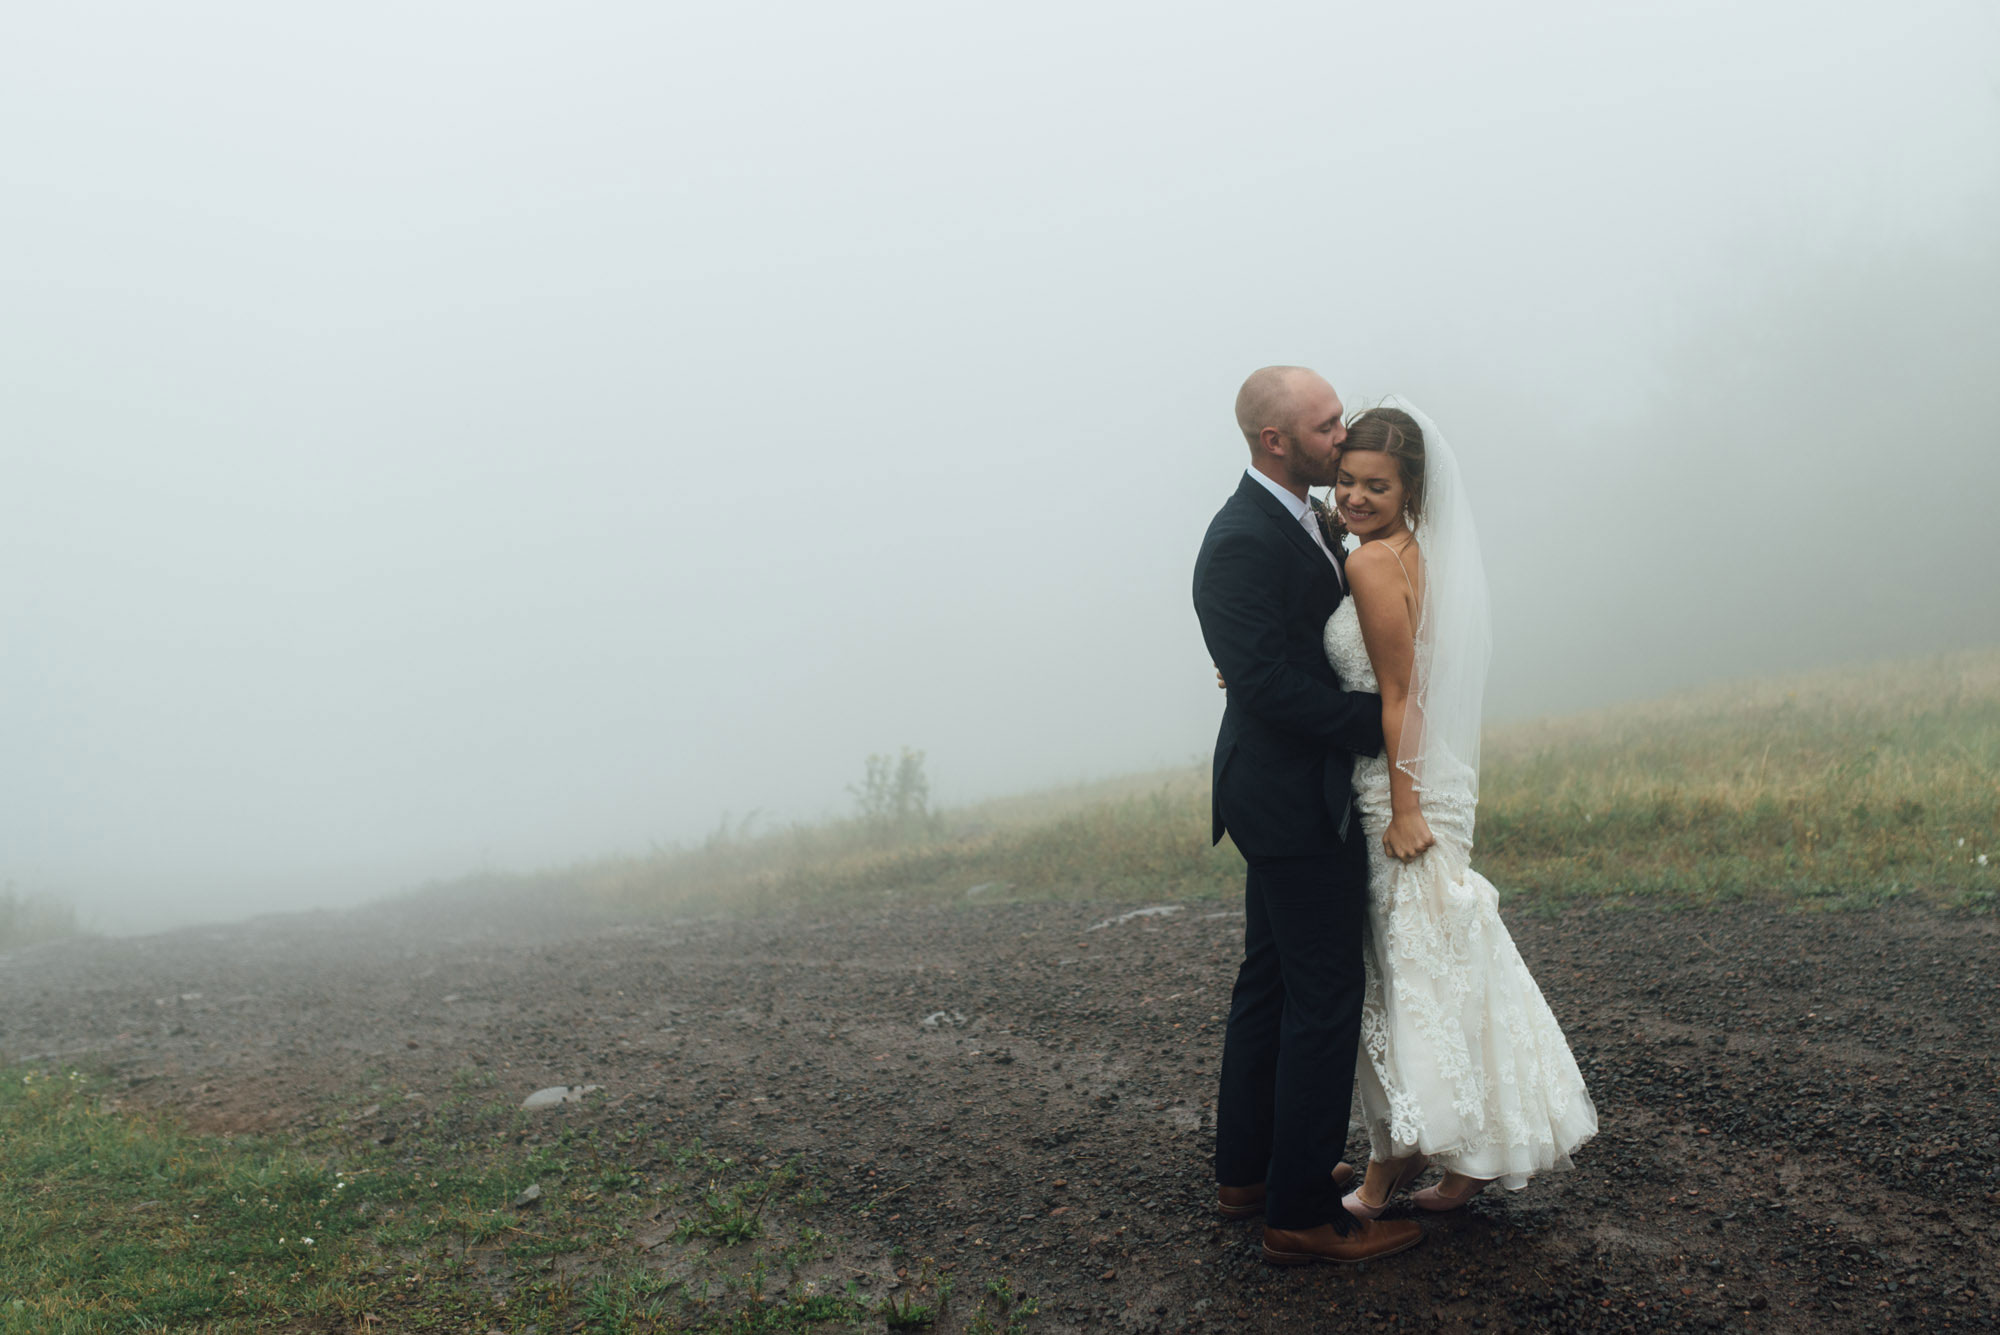 lutsen-mountain-minnesota-wedding-photographer-1-3.jpg